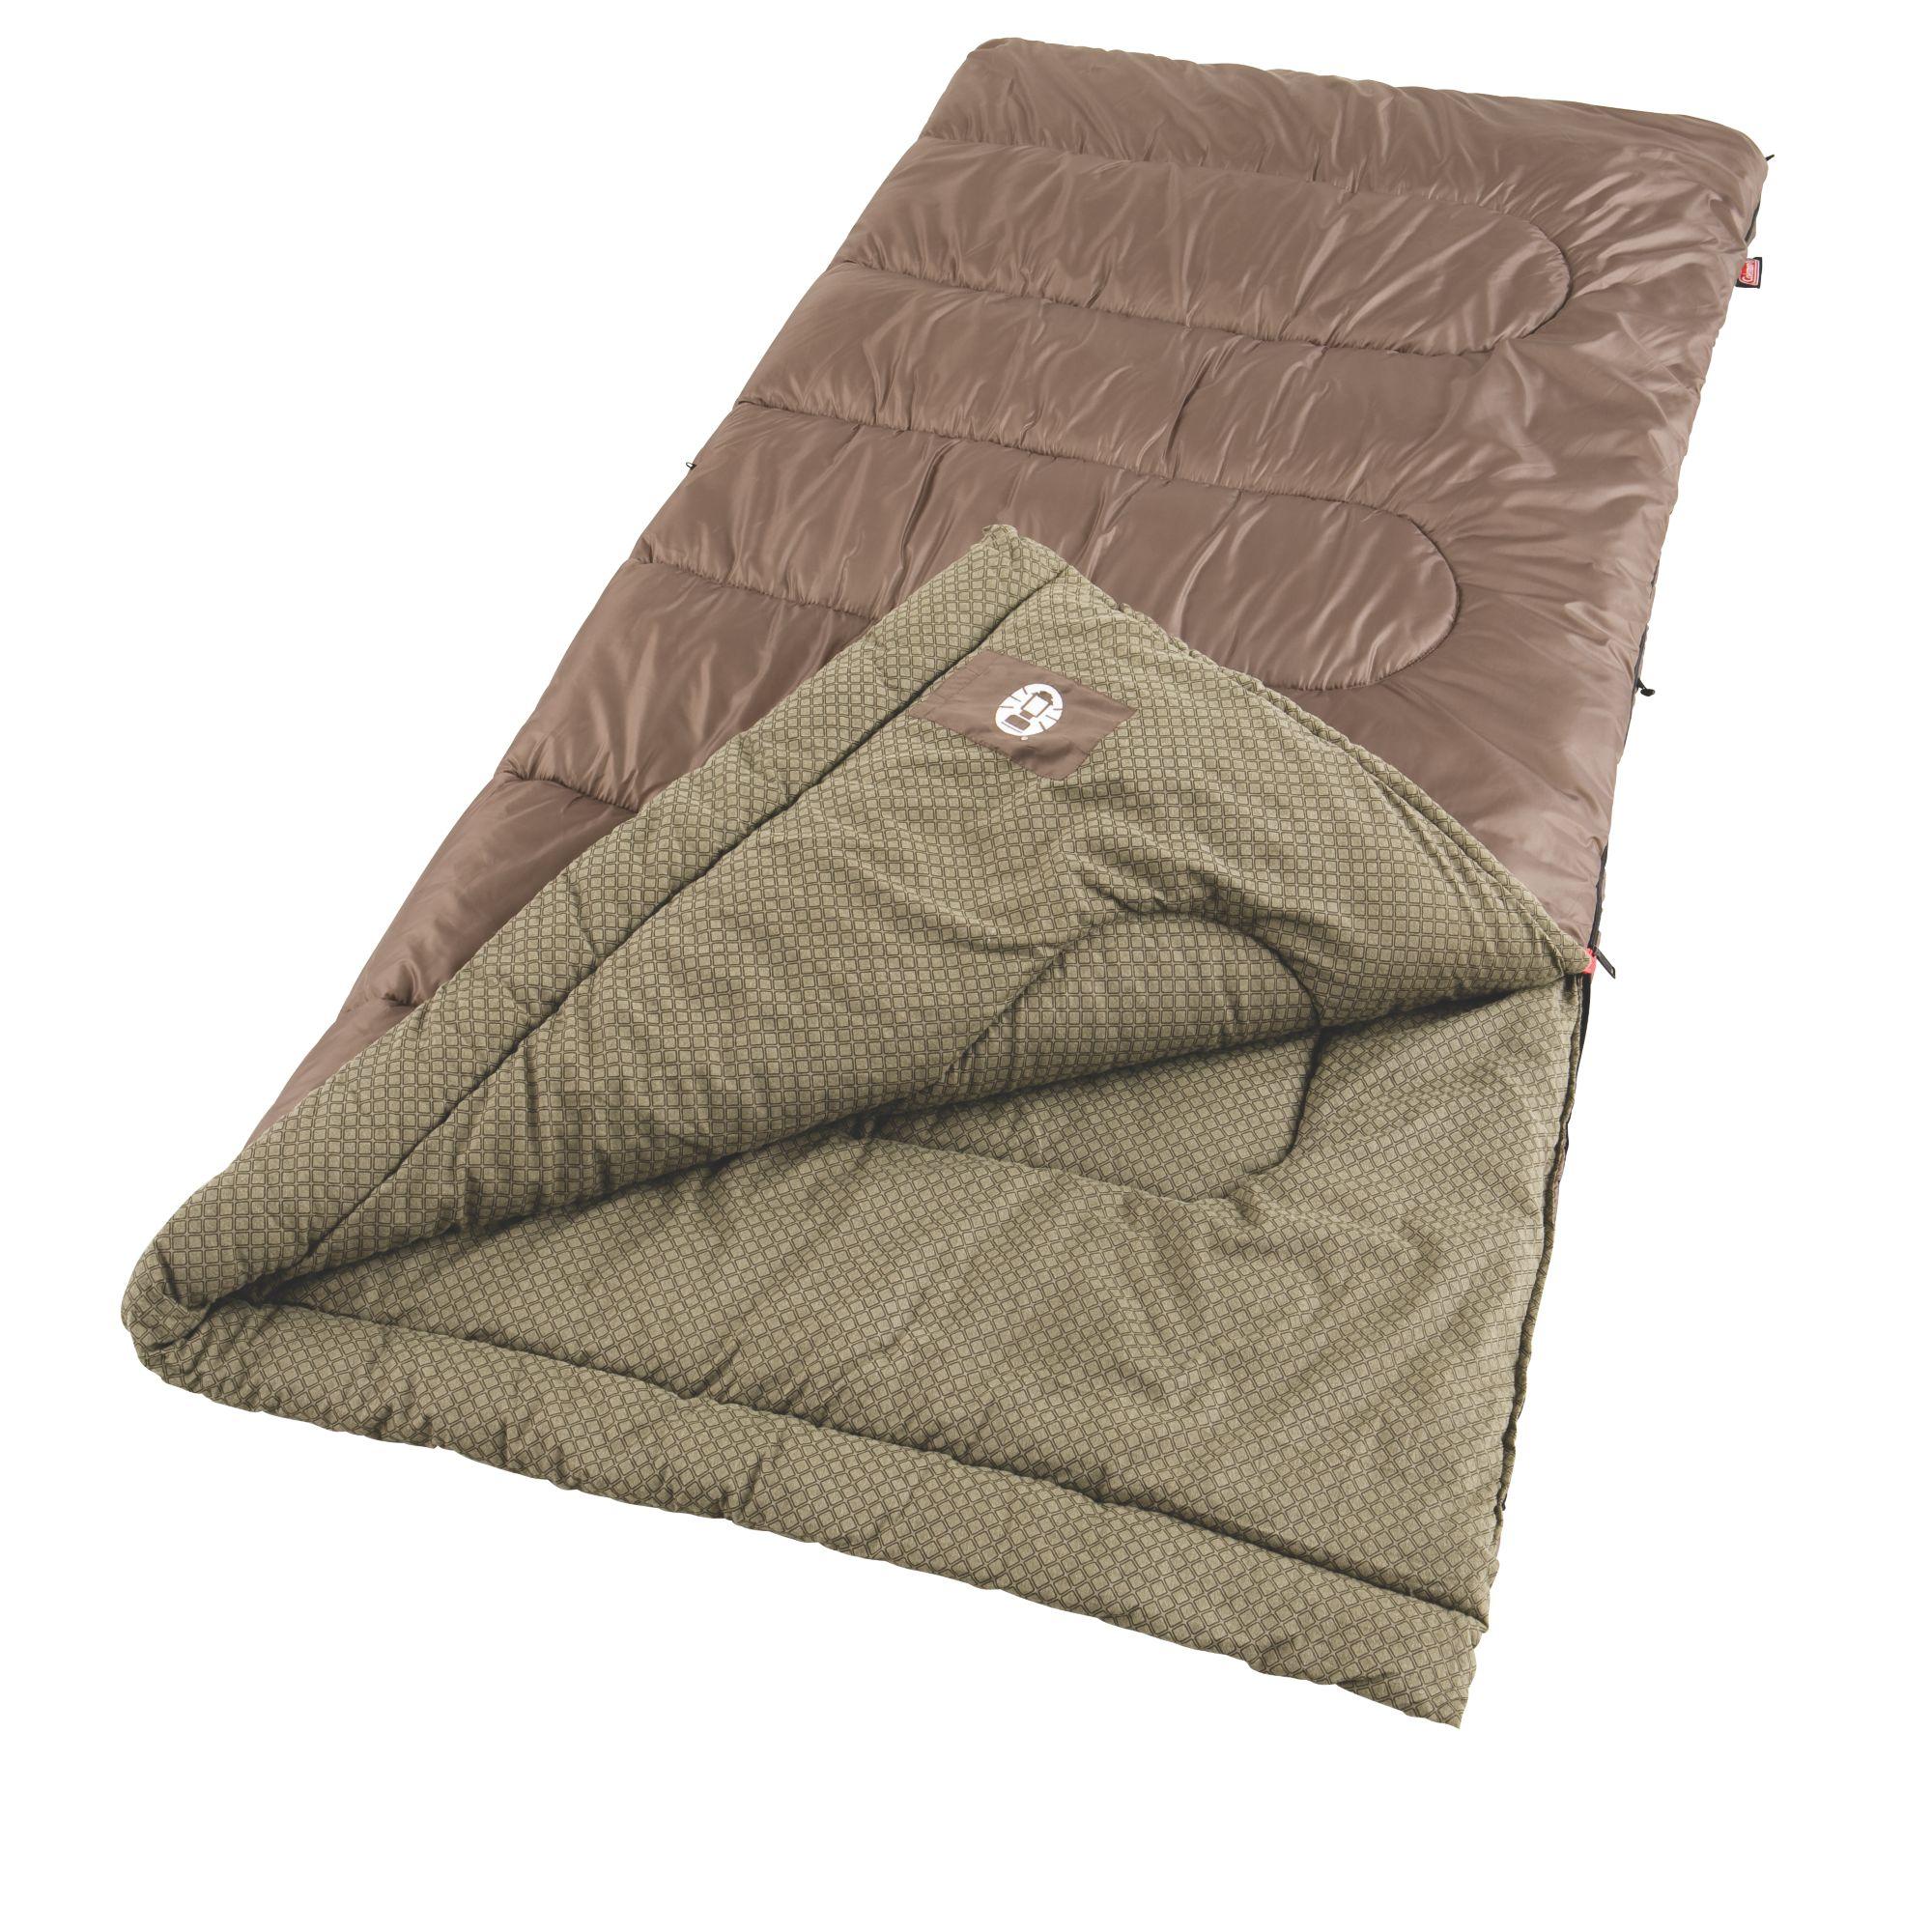 ColemanR Oak PointTM Cool Weather Sleeping Bag